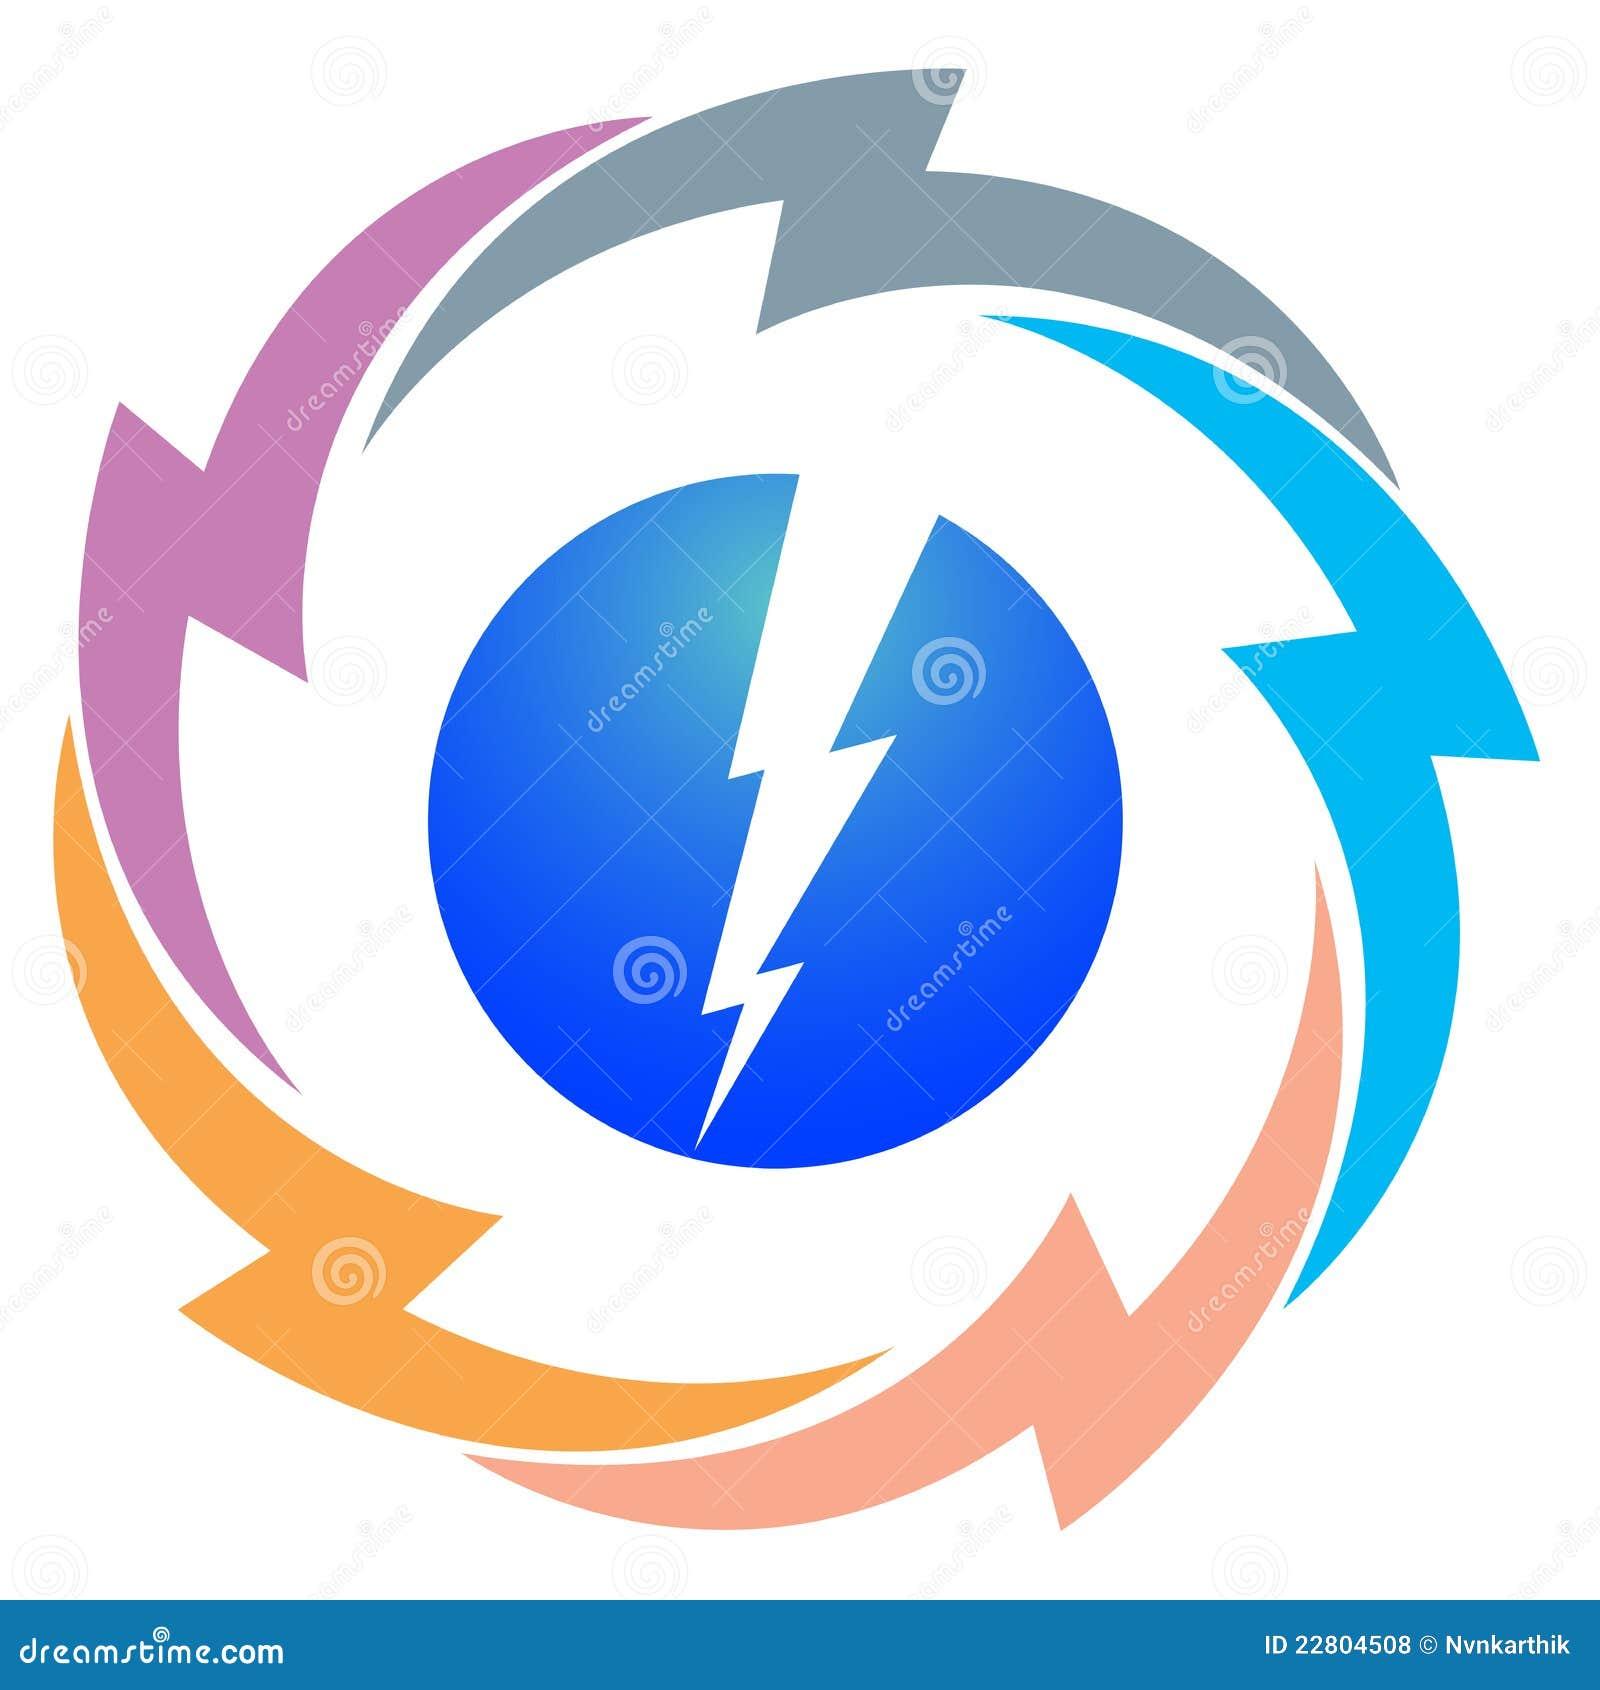 power logo royalty free stock photos image 22804508